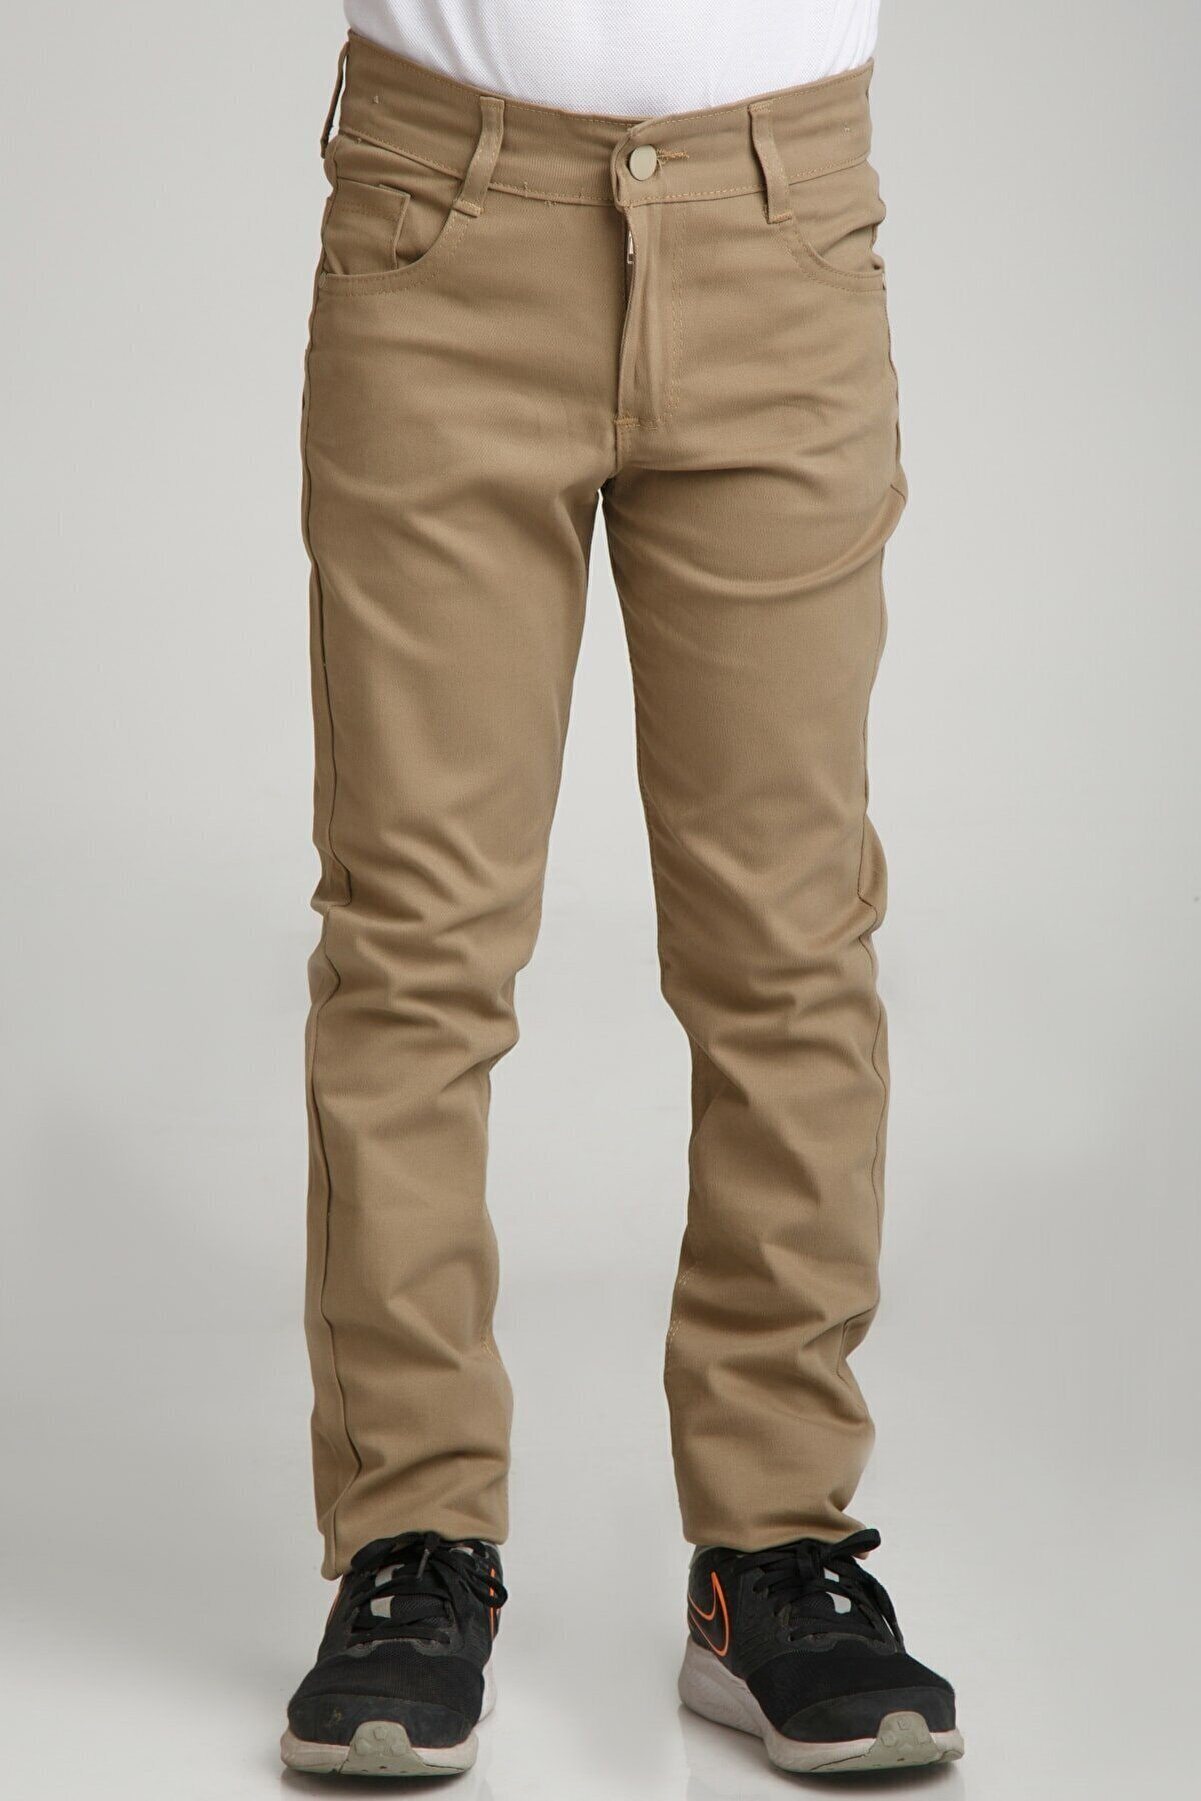 nacar çarşı Unısex Spor Model Camel Canvas Pantolon